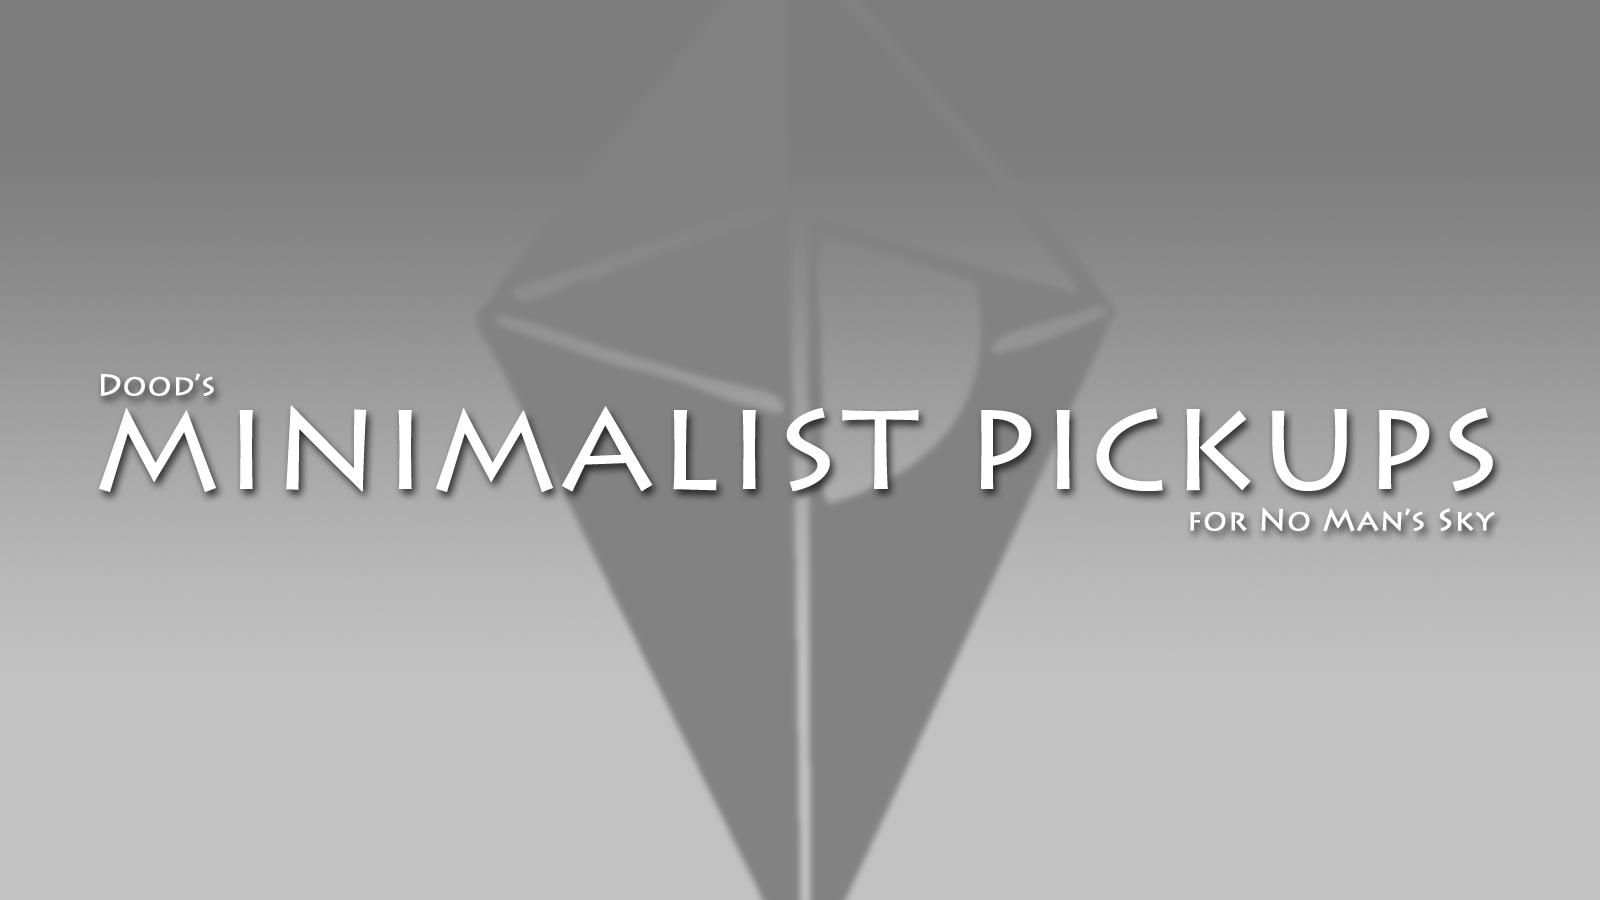 Dood's Minimalist Pickups